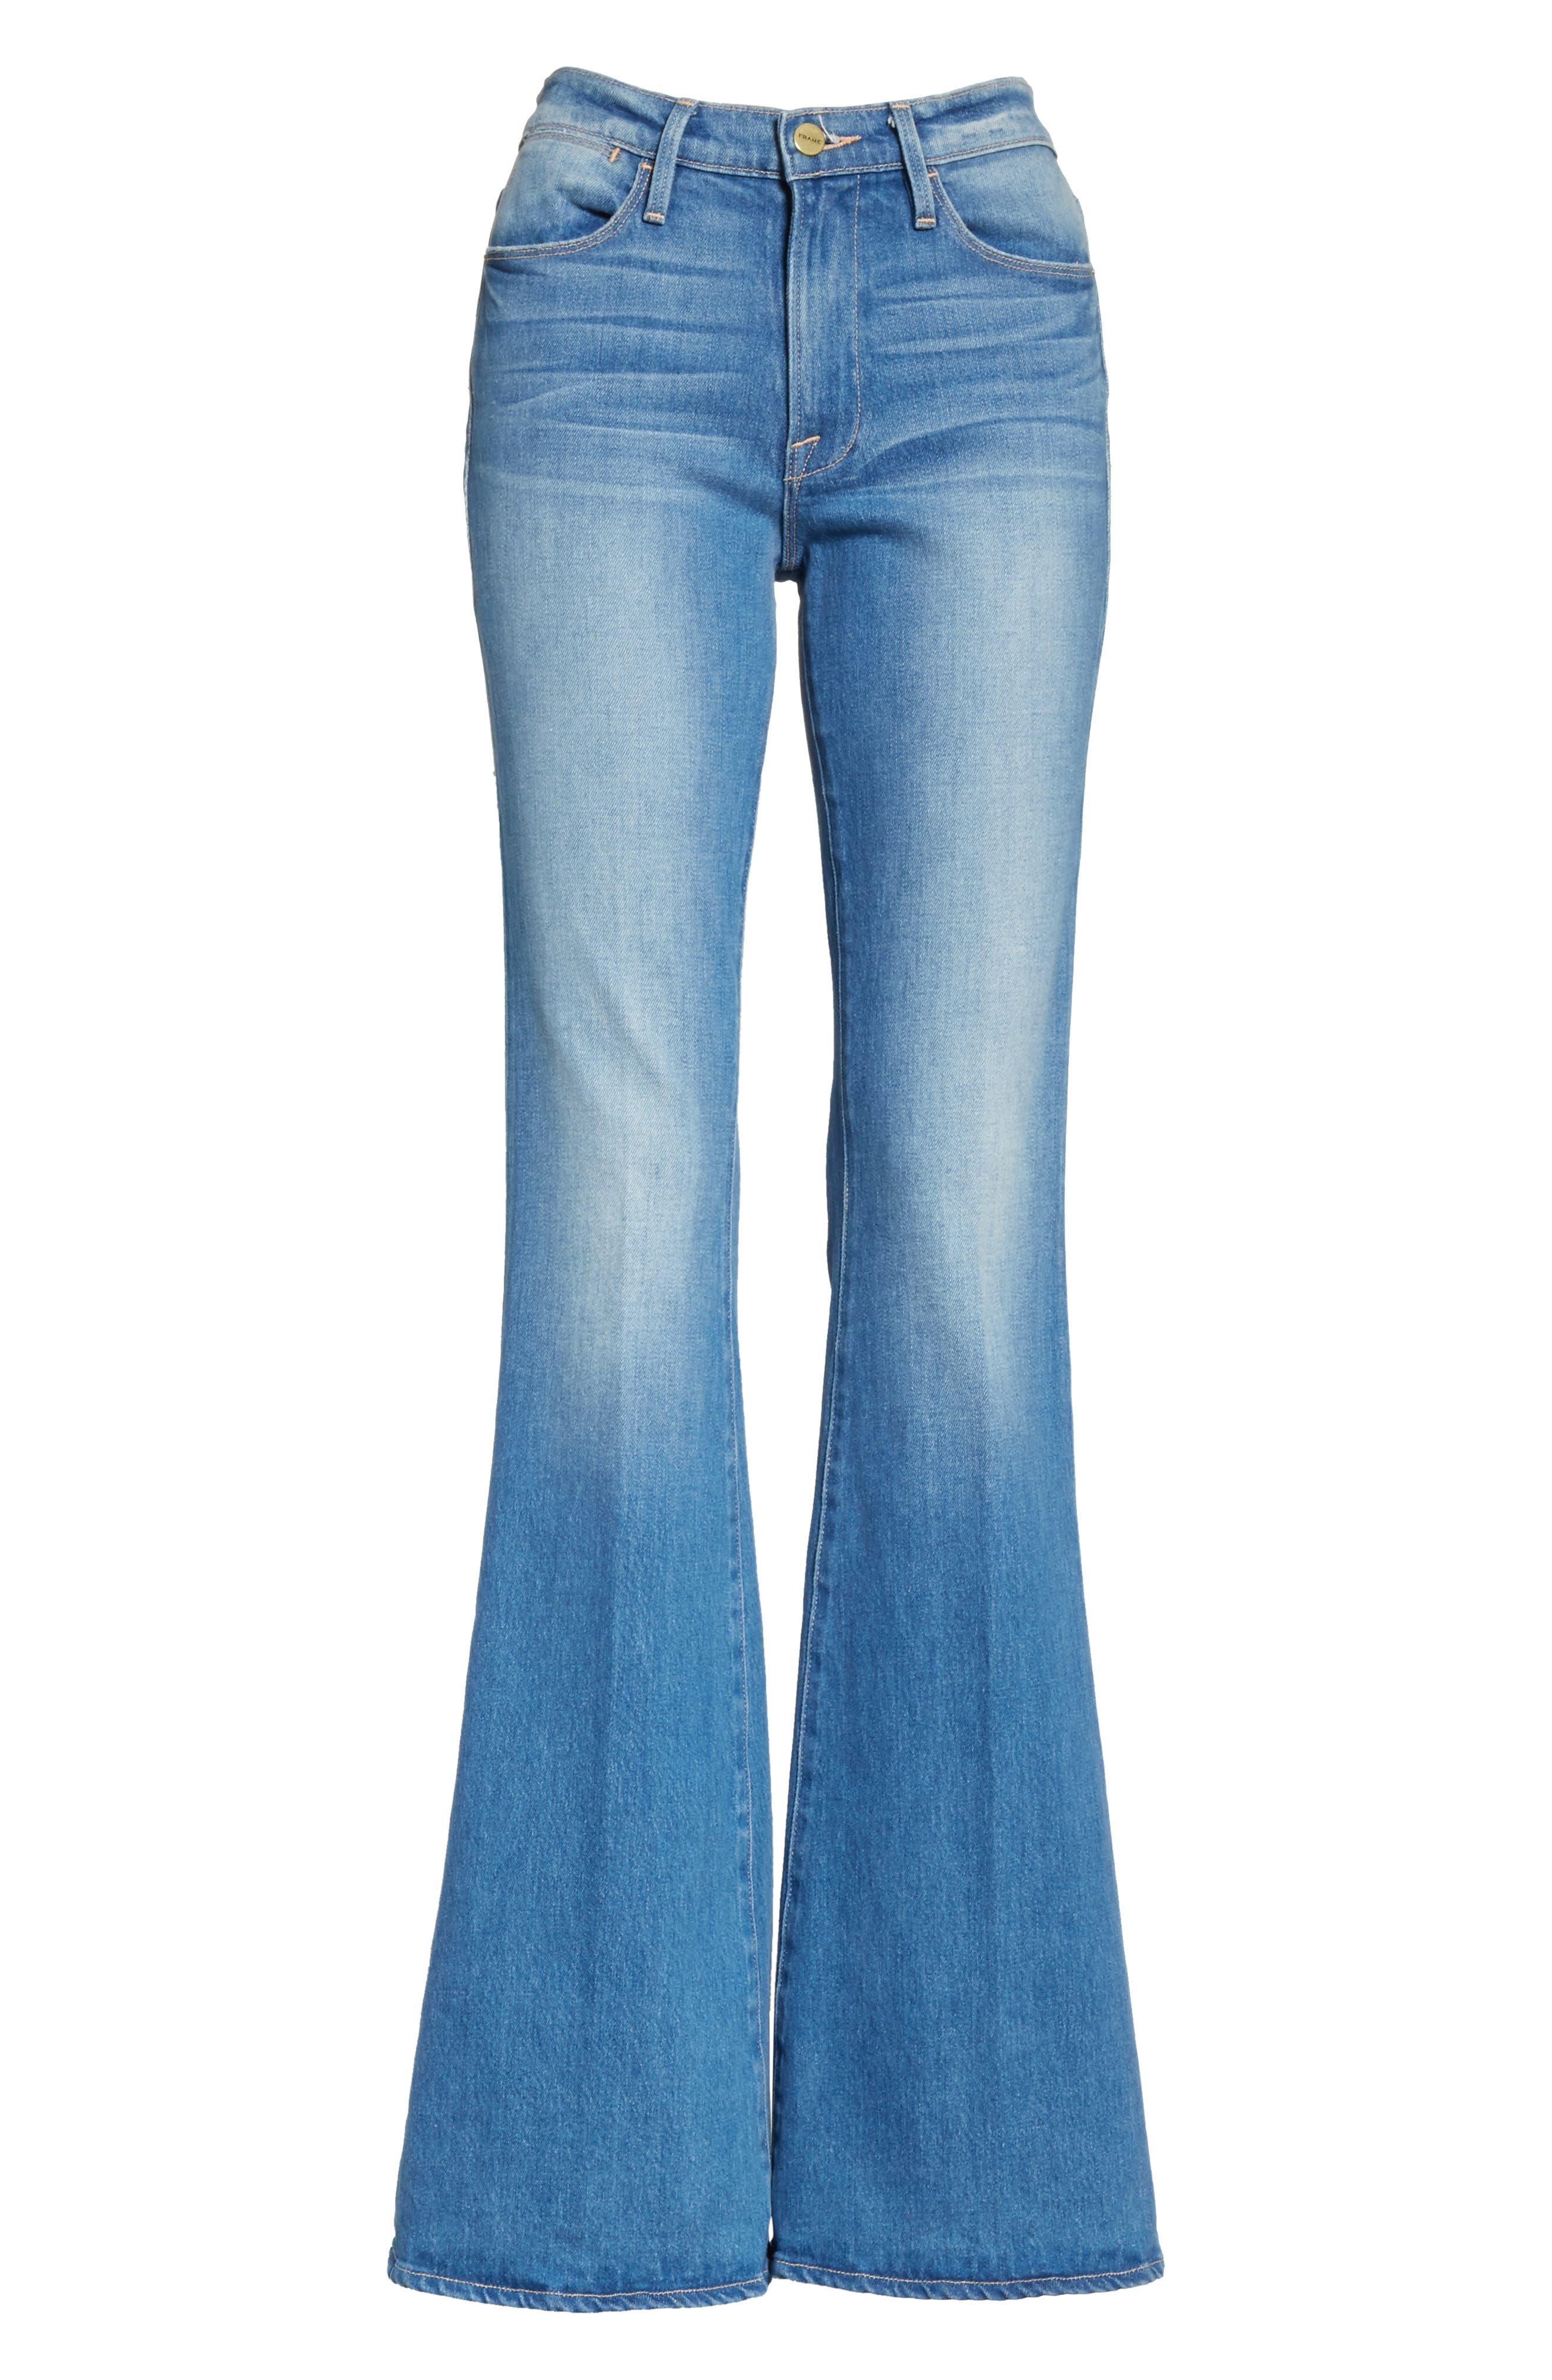 Le High Flare Jeans,                             Alternate thumbnail 7, color,                             Brightwalton